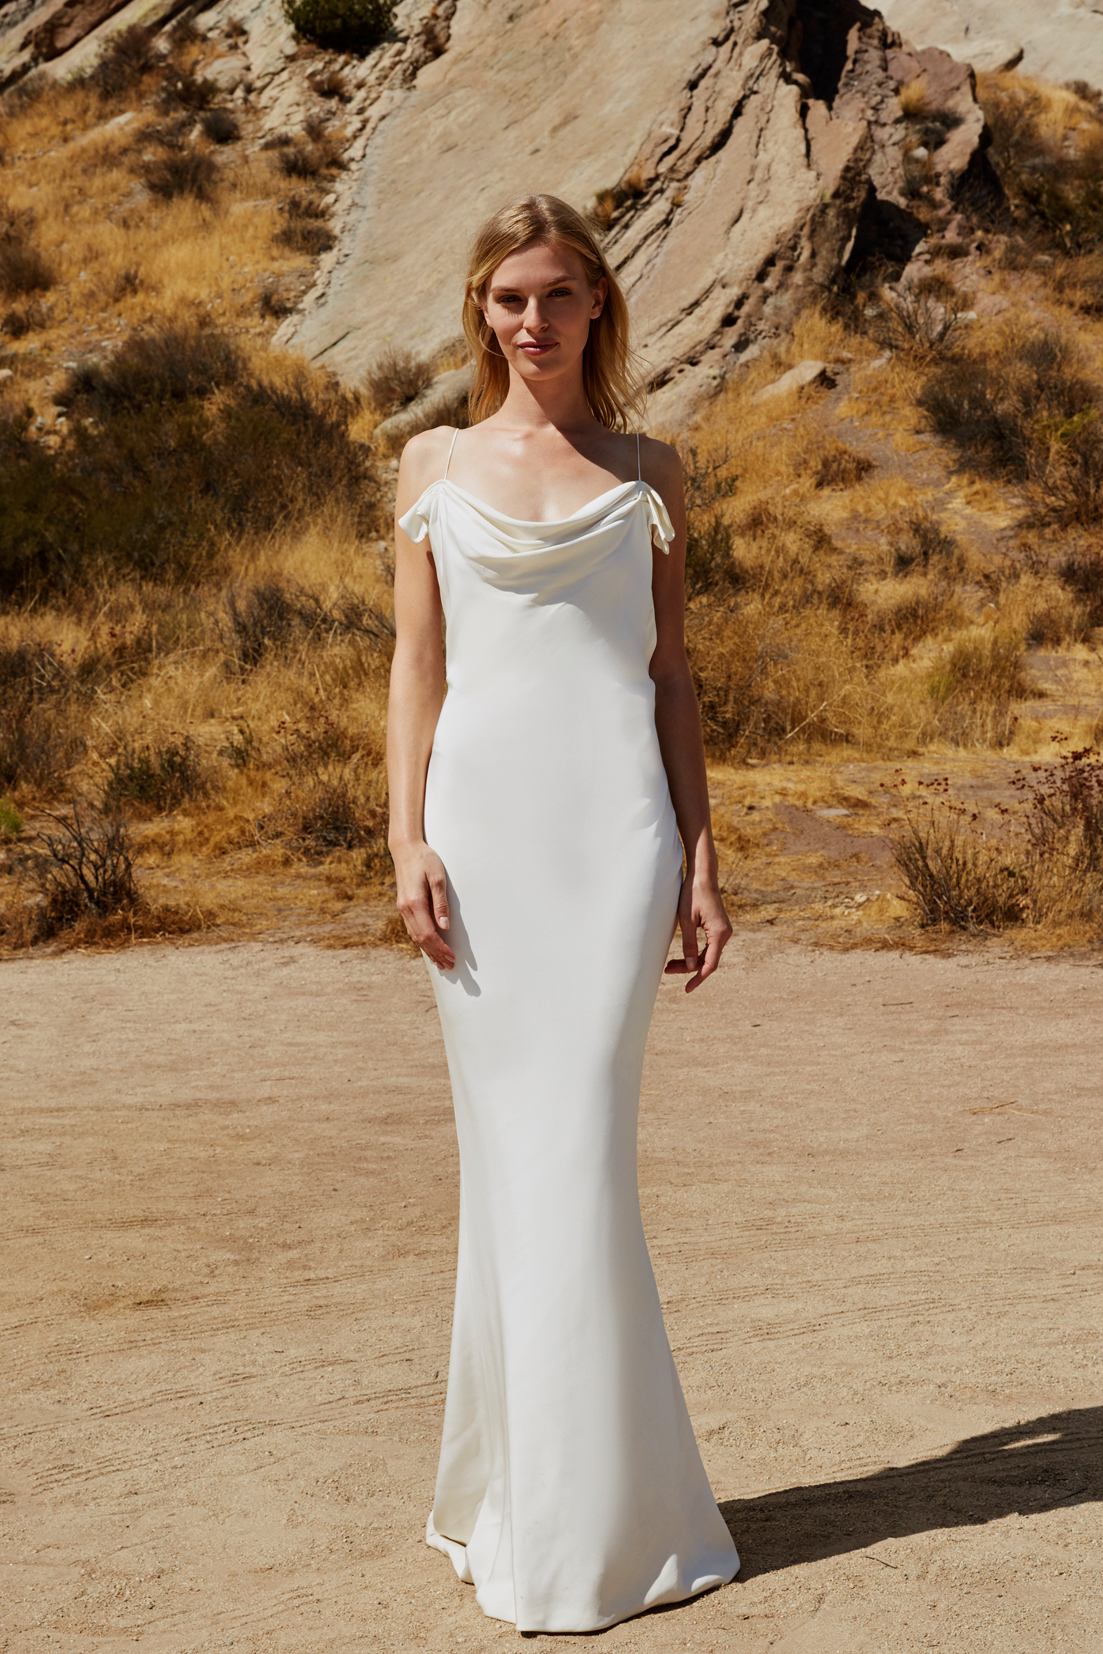 savannah miller fall 2018 spaghetti strap wedding dress